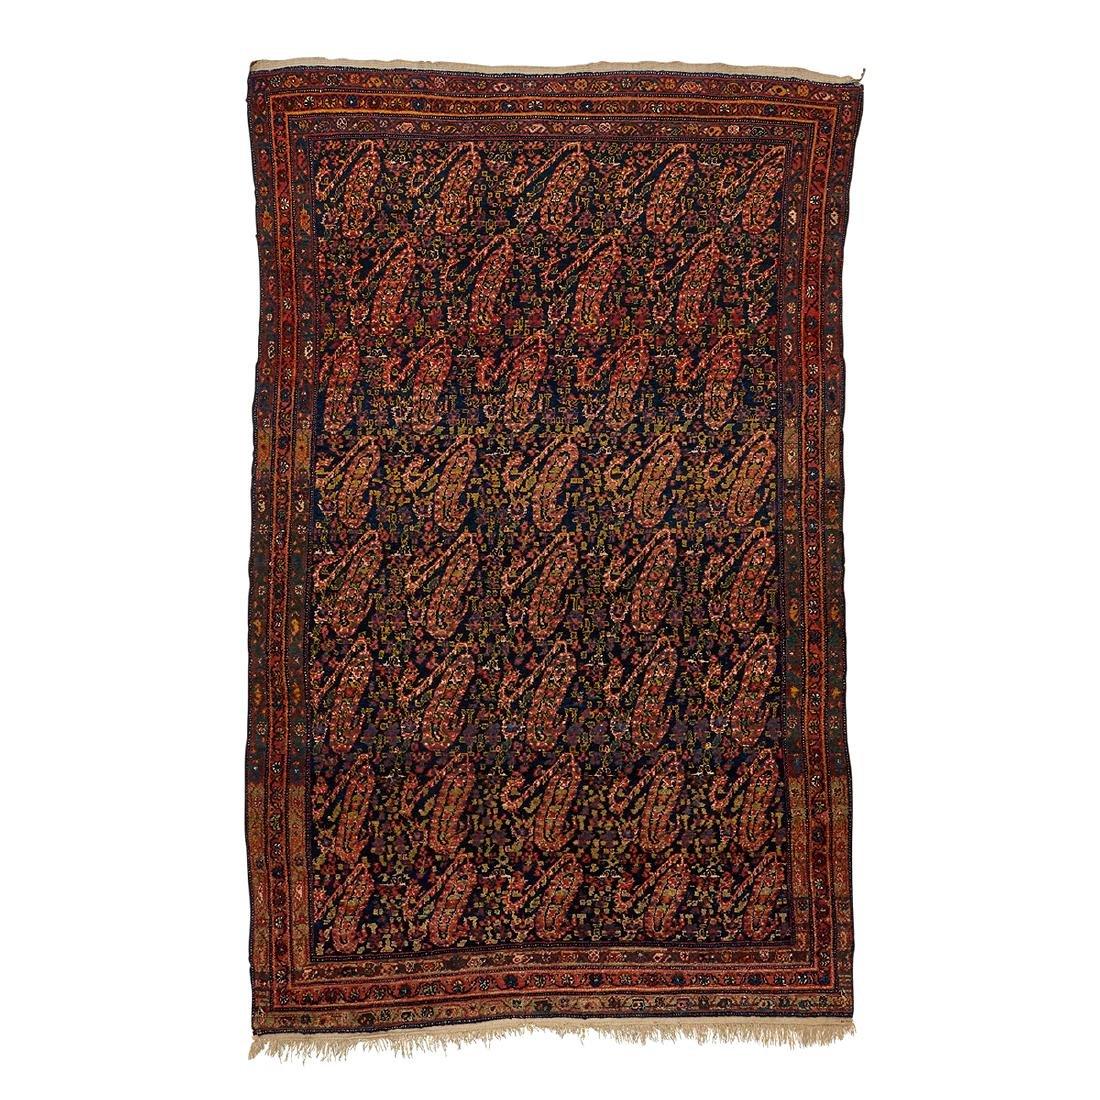 Antique Persian Senneh wool area rug